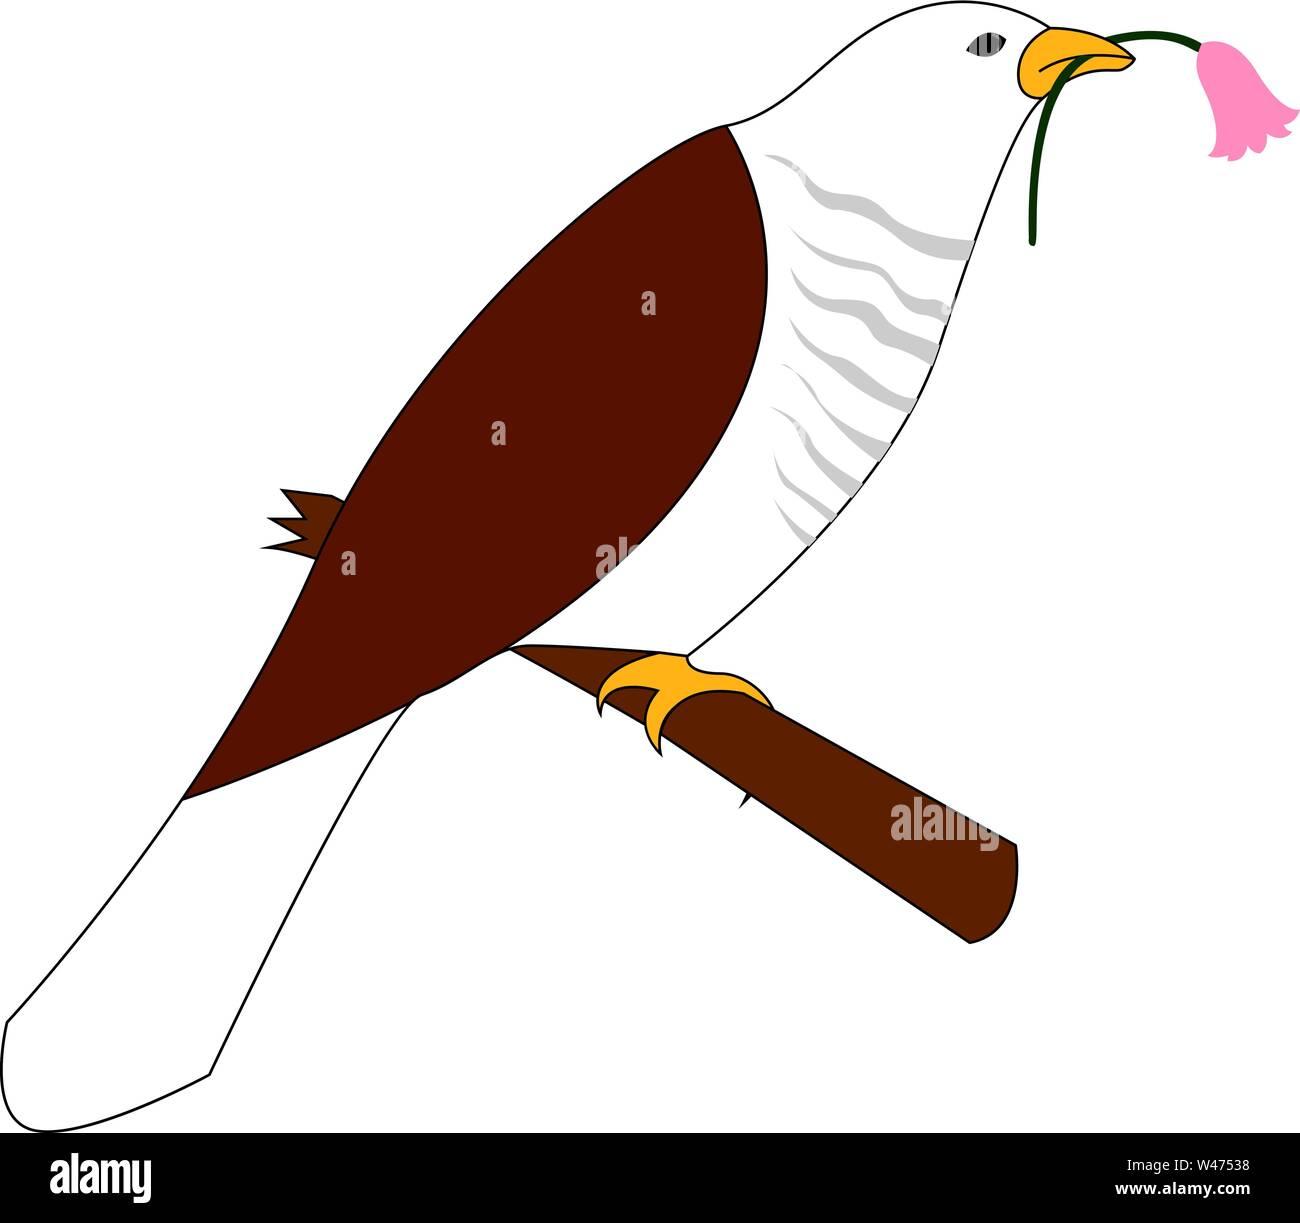 Cuckoo bird, illustration, vector on white background. - Stock Image